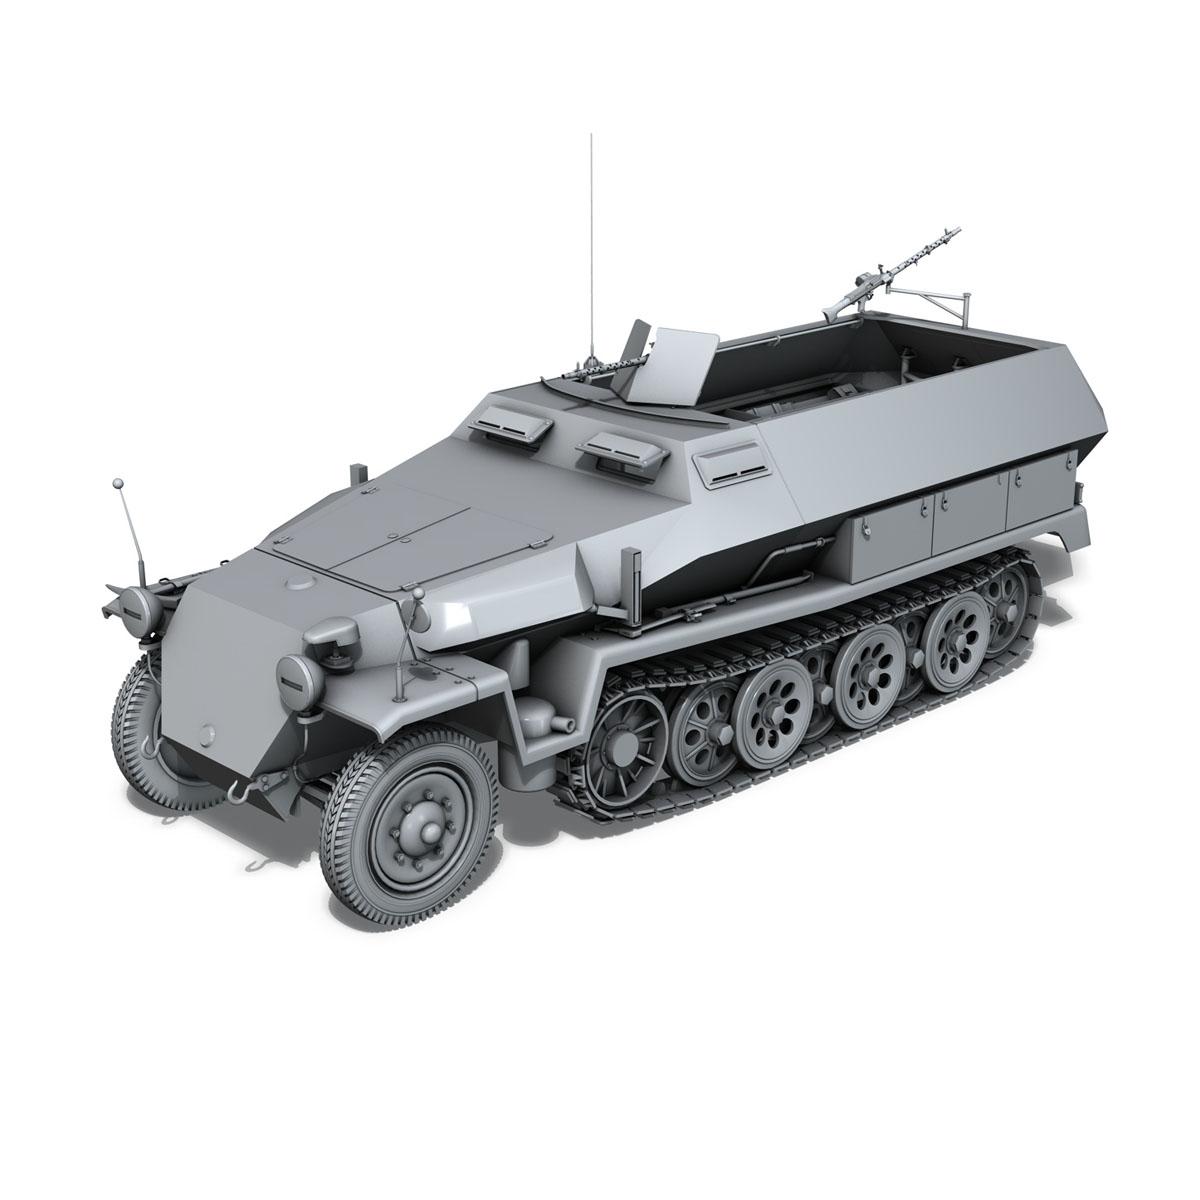 sd.kfz 251/1 ausf.c – hanomag halftruck 3d model 3ds fbx c4d lwo obj 201164